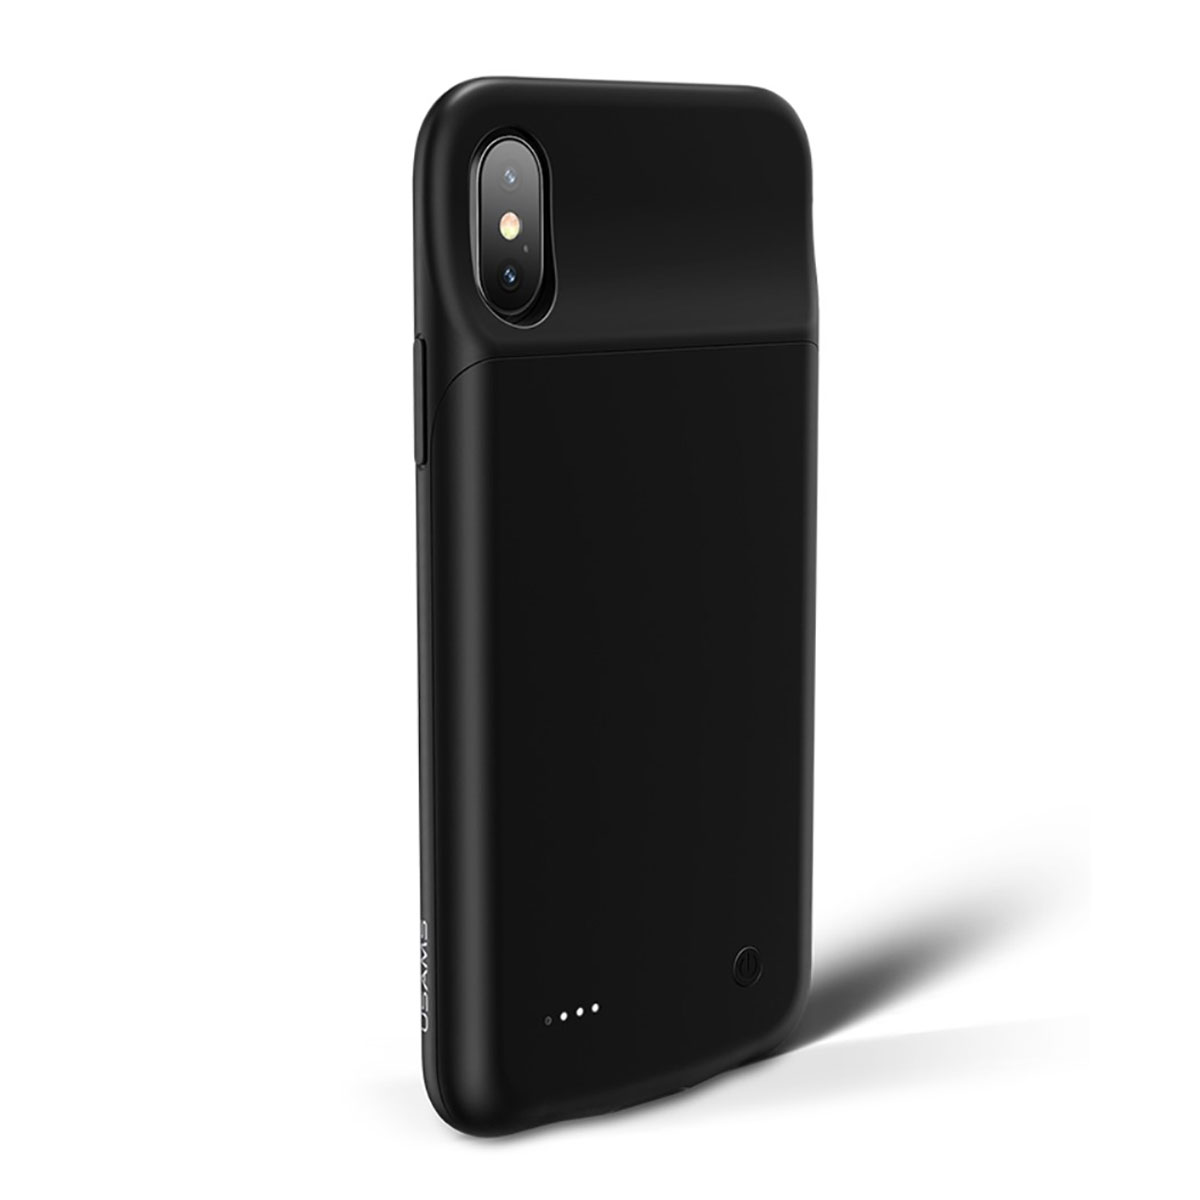 Batterie Extern Akku Case Hülle für iPhone X 3200mAh - schwarz